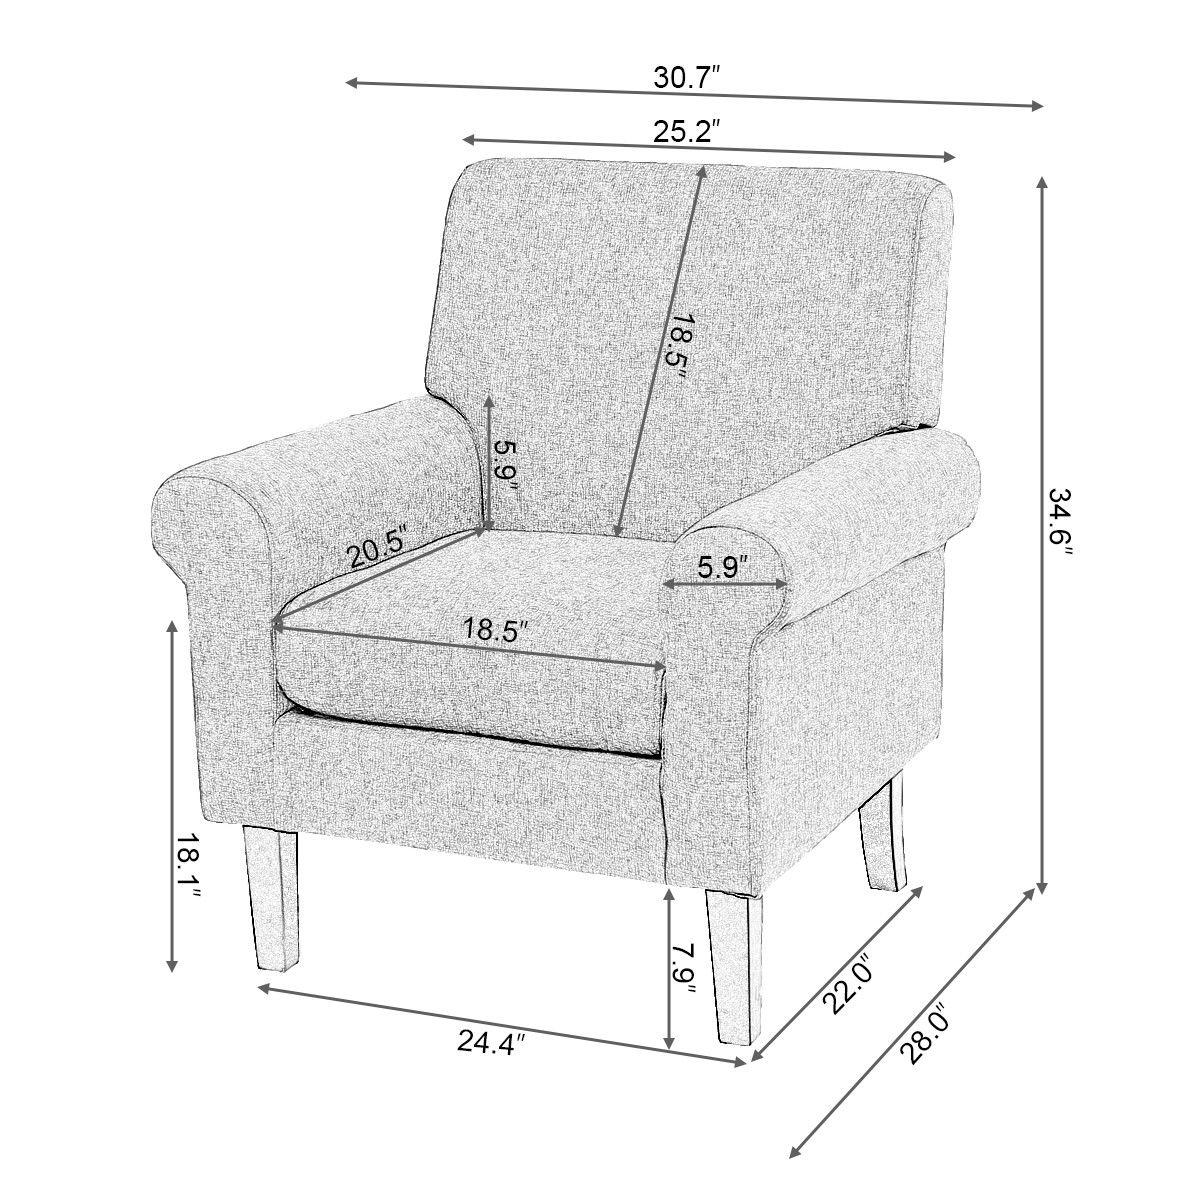 Giantex Fabirc Living Room Chair Modern Gray Accent Arm Chair Ergonomic Upholstered Single Sofa Home Furniture HW56828